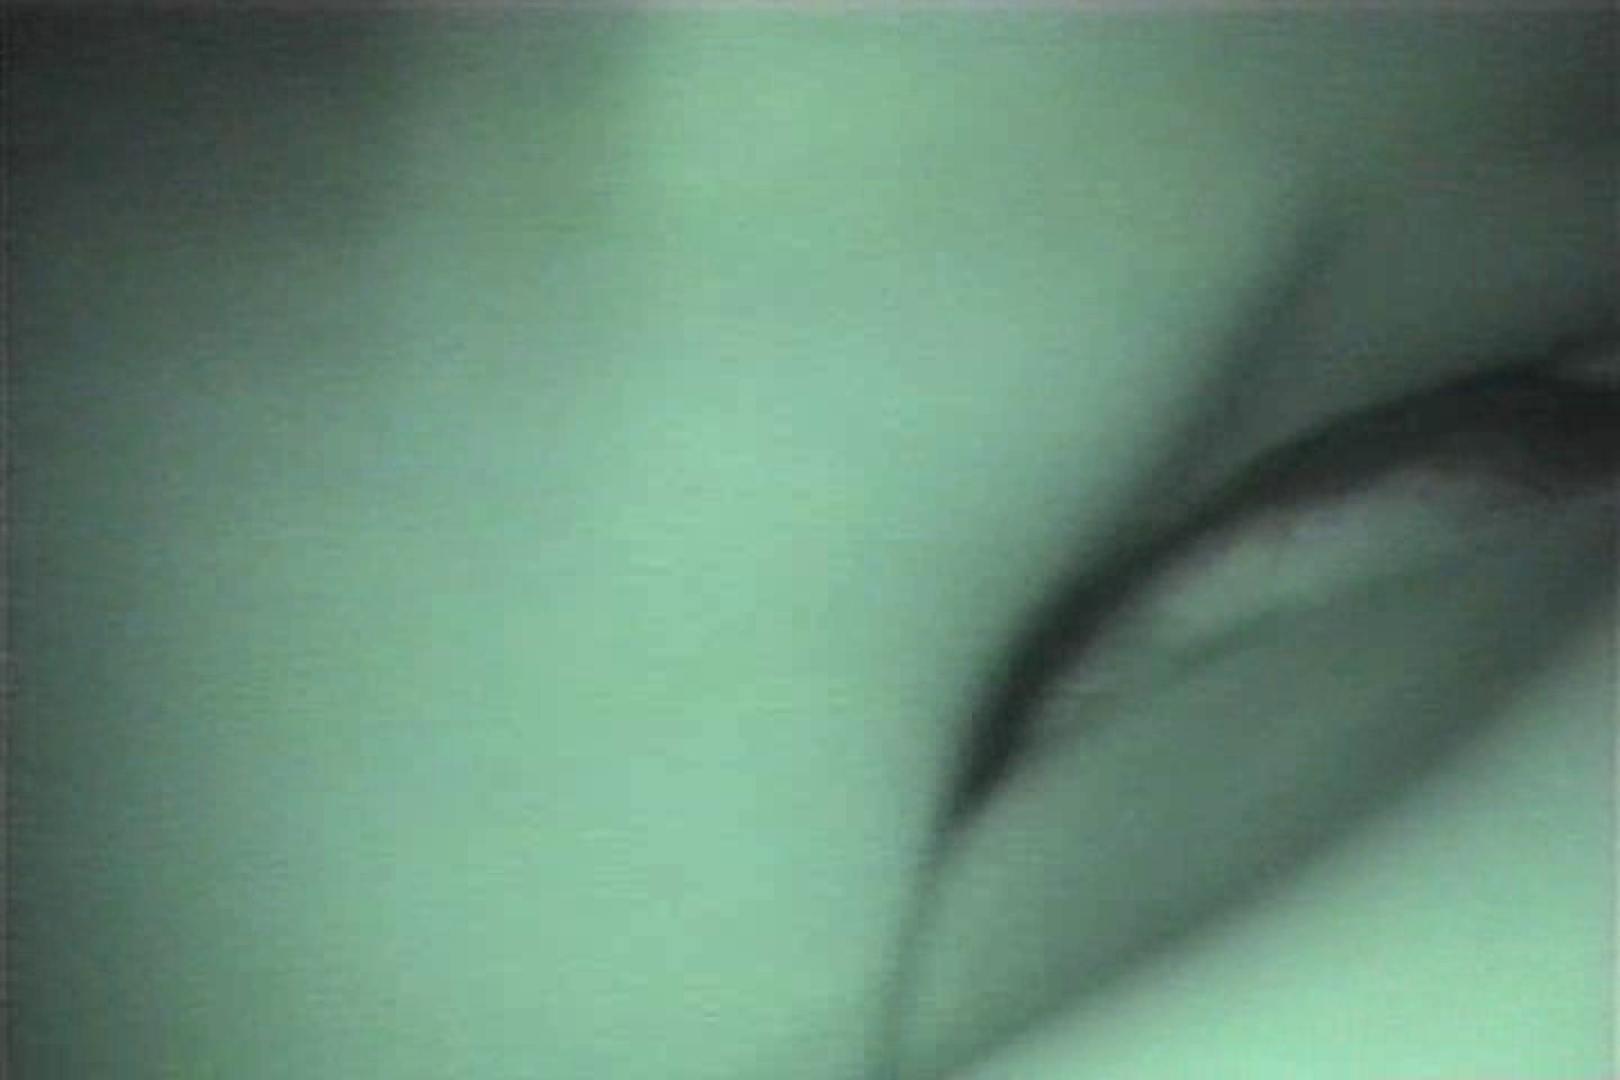 MASAさんの待ち伏せ撮り! 赤外線カーセックスVol.8 OLの実態  55pic 28